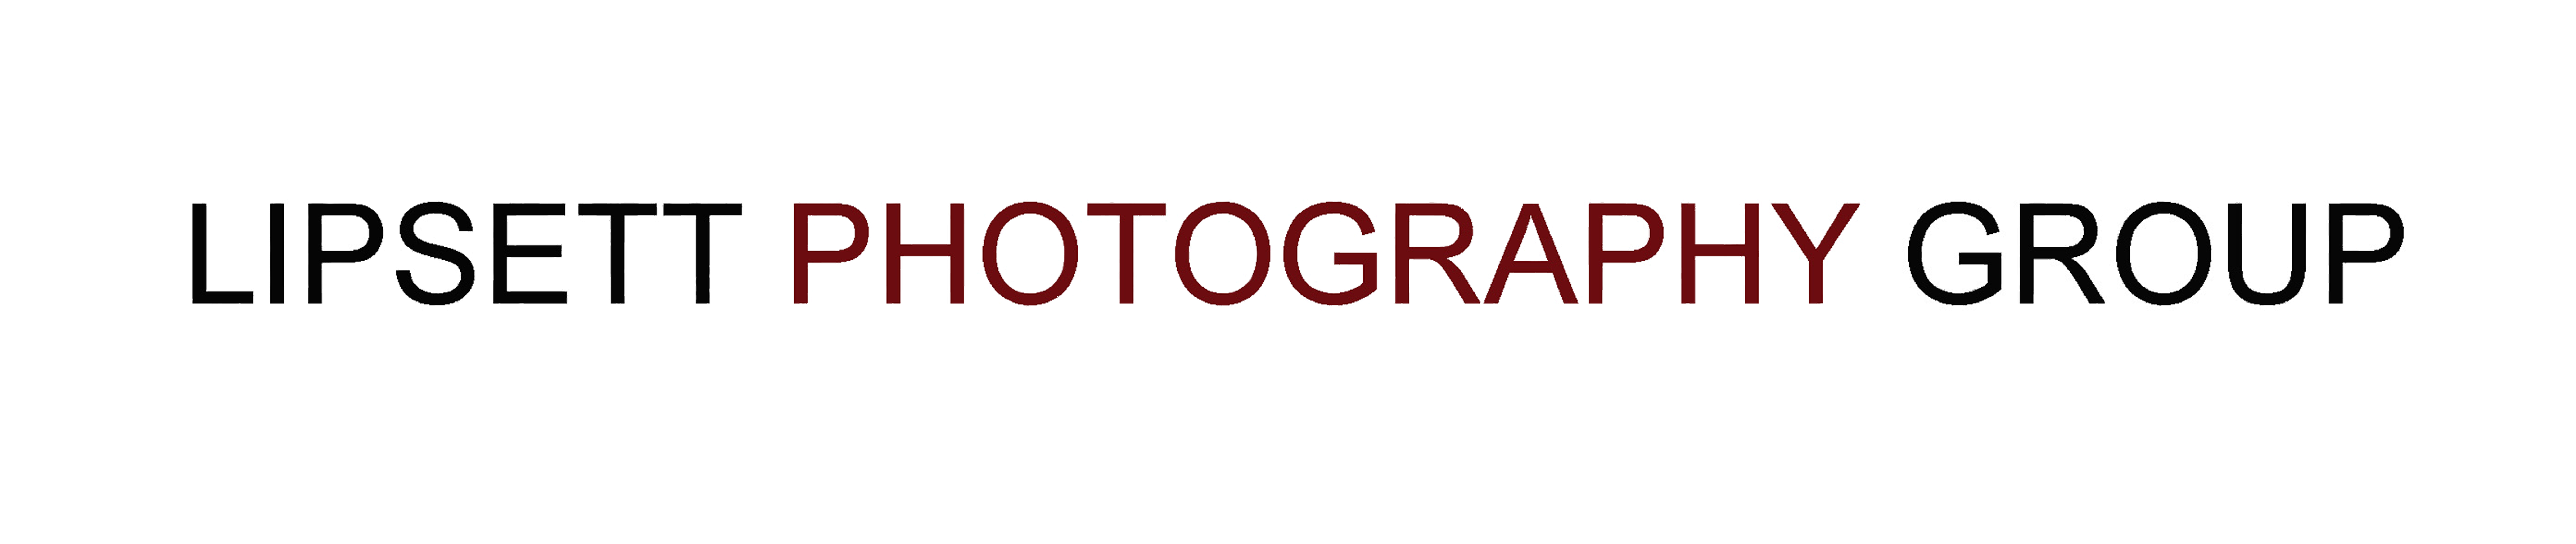 Lipsett Photography Group